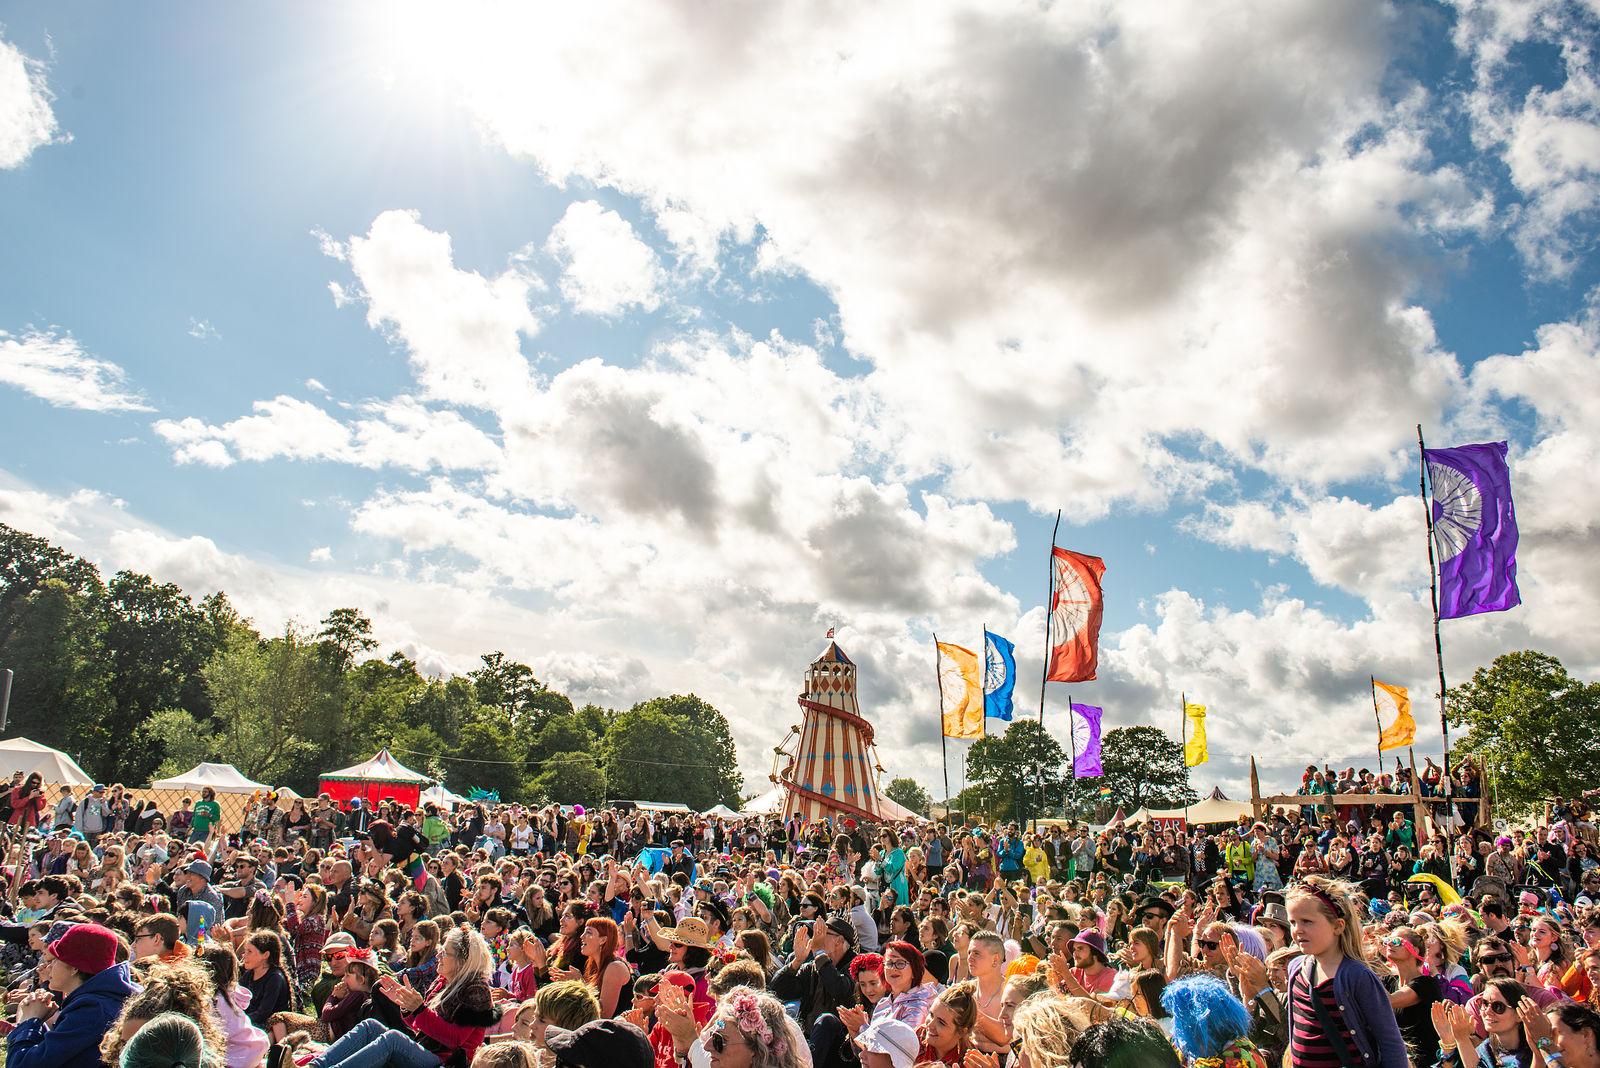 Shambala Festival 2018